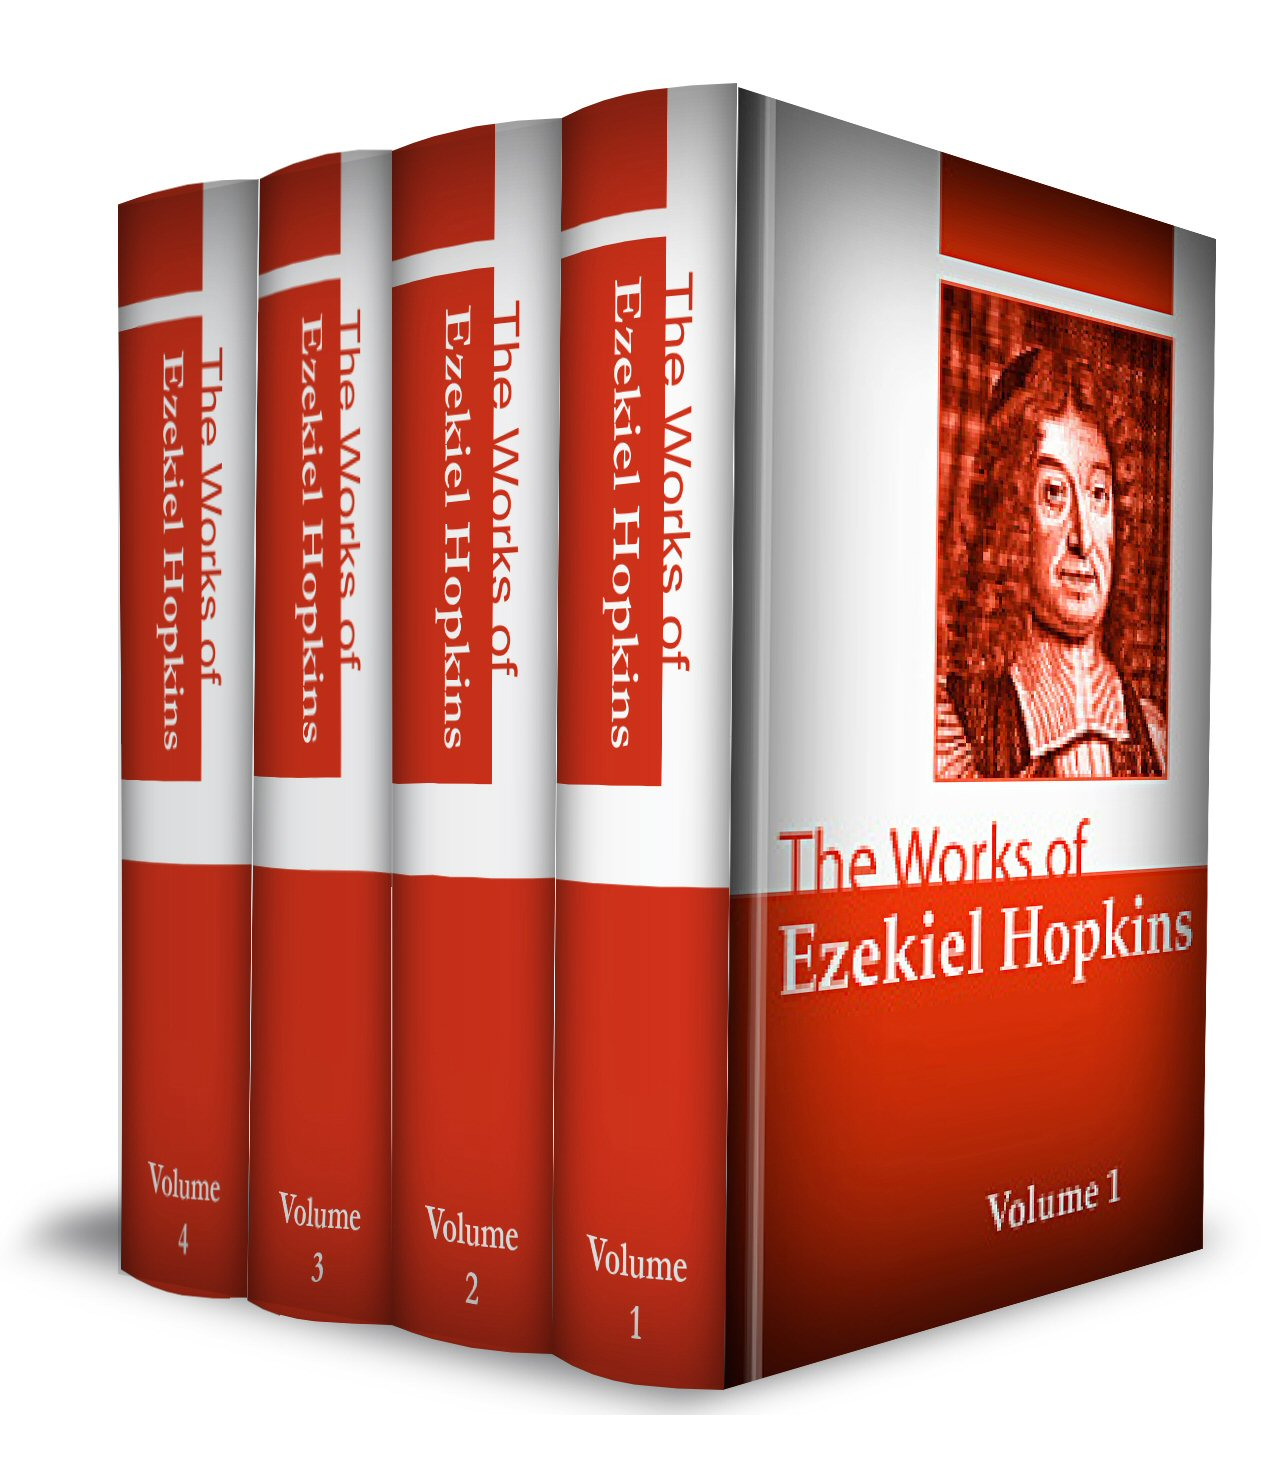 The Works of Ezekiel Hopkins (4 vols.)